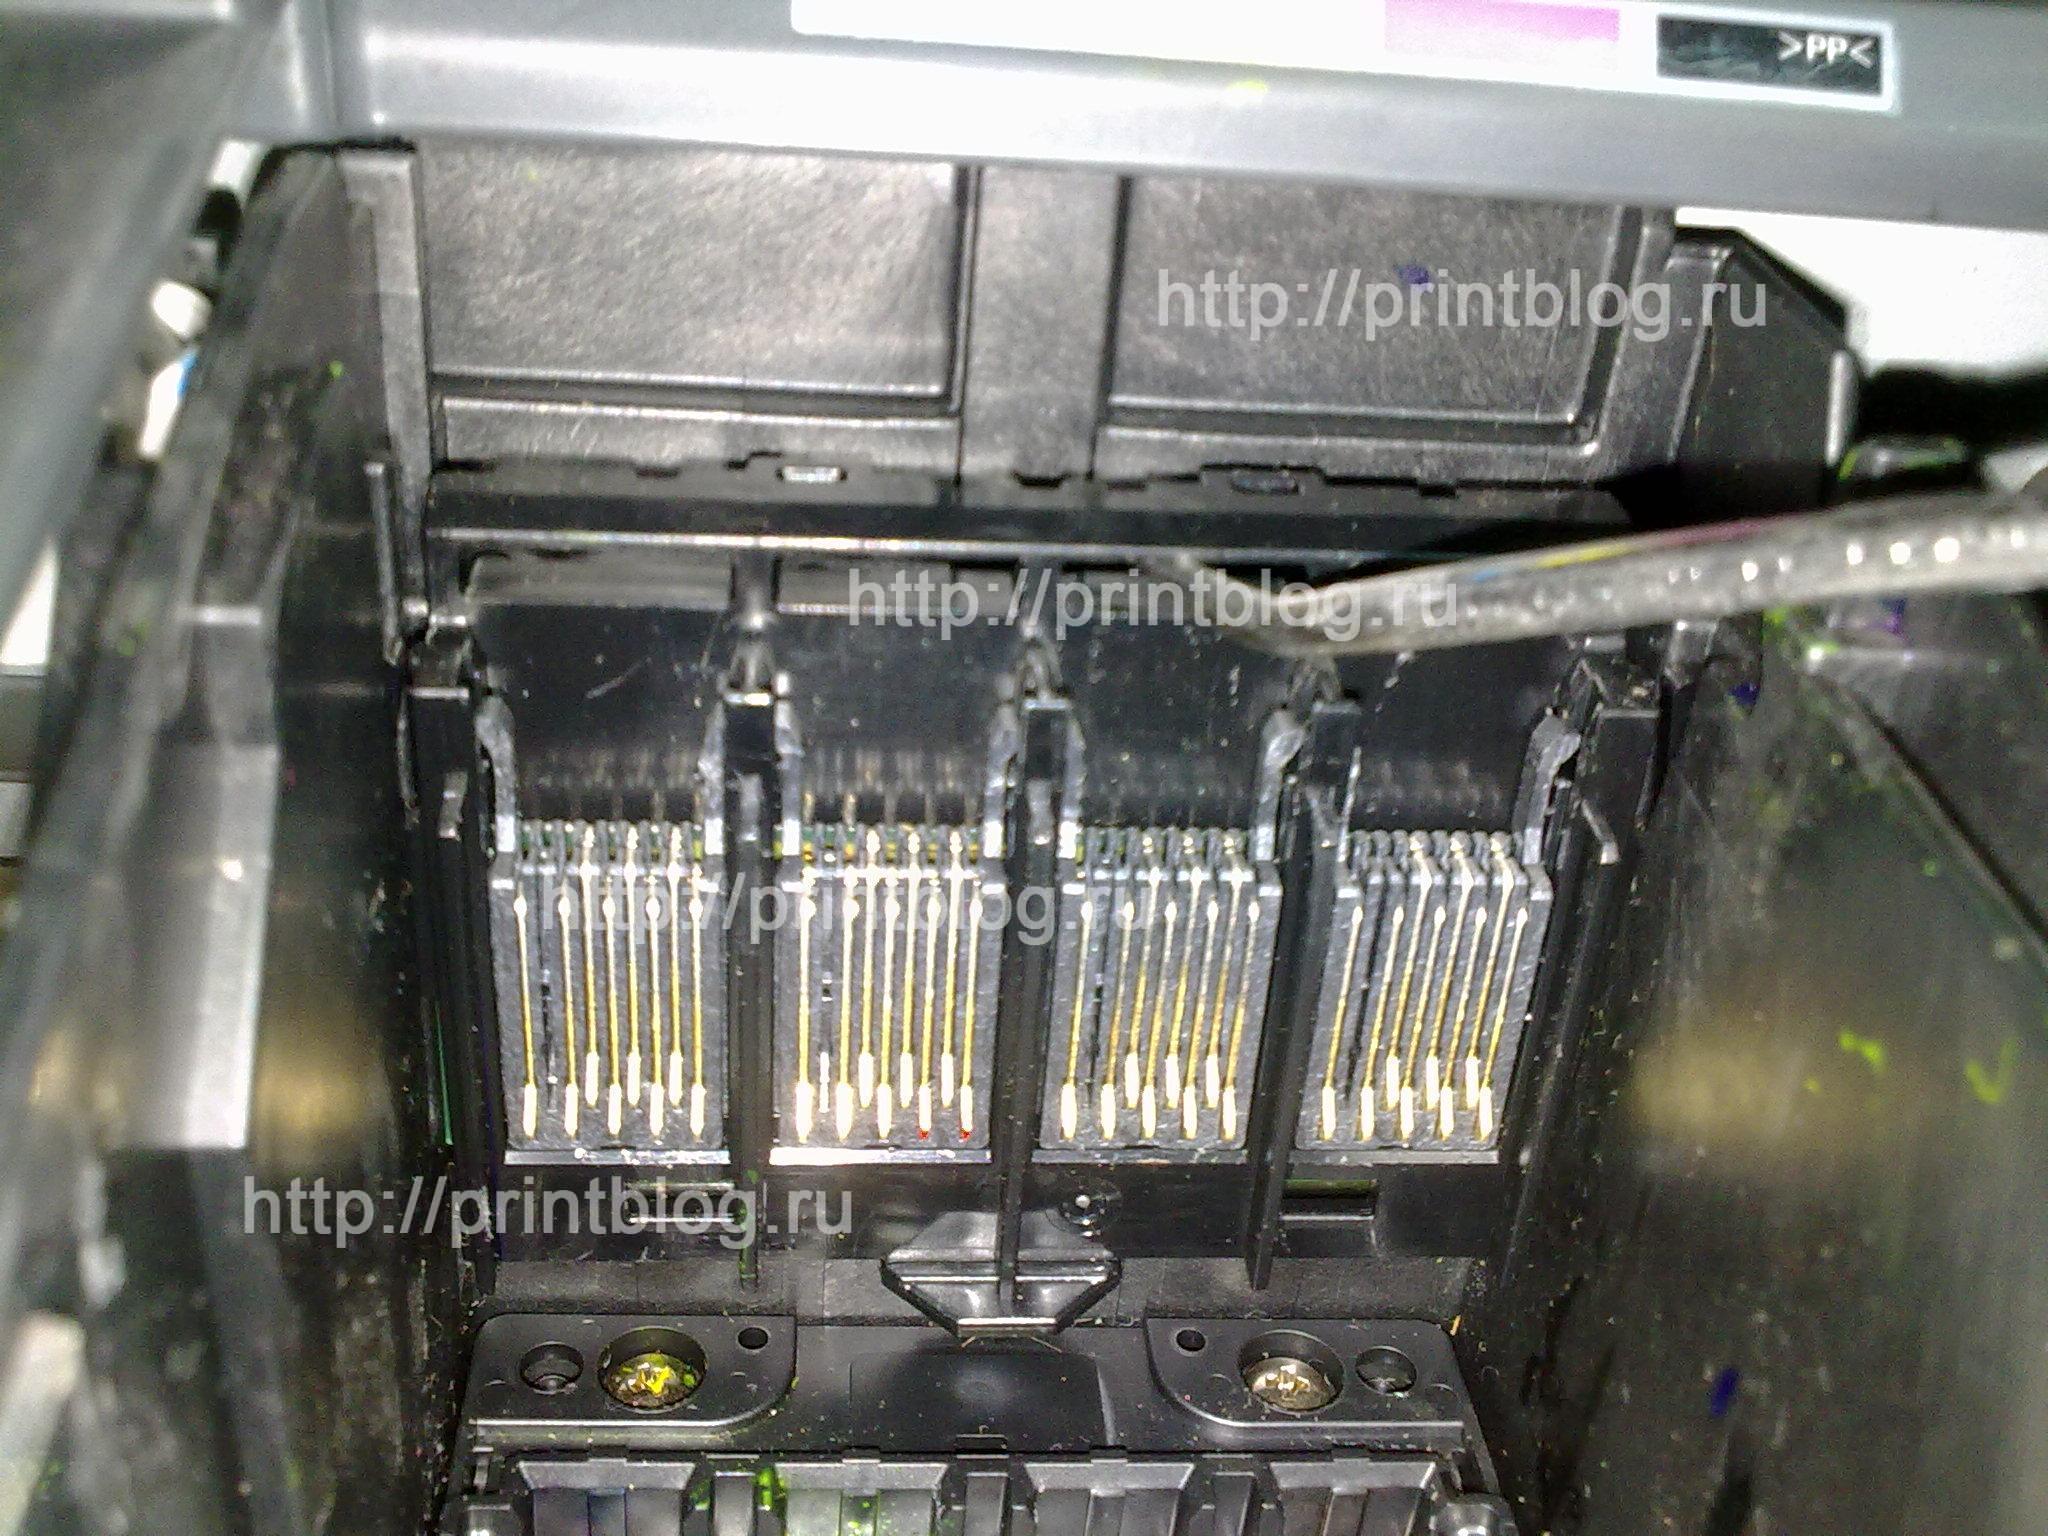 Epson Stylus cx5500 service Manual